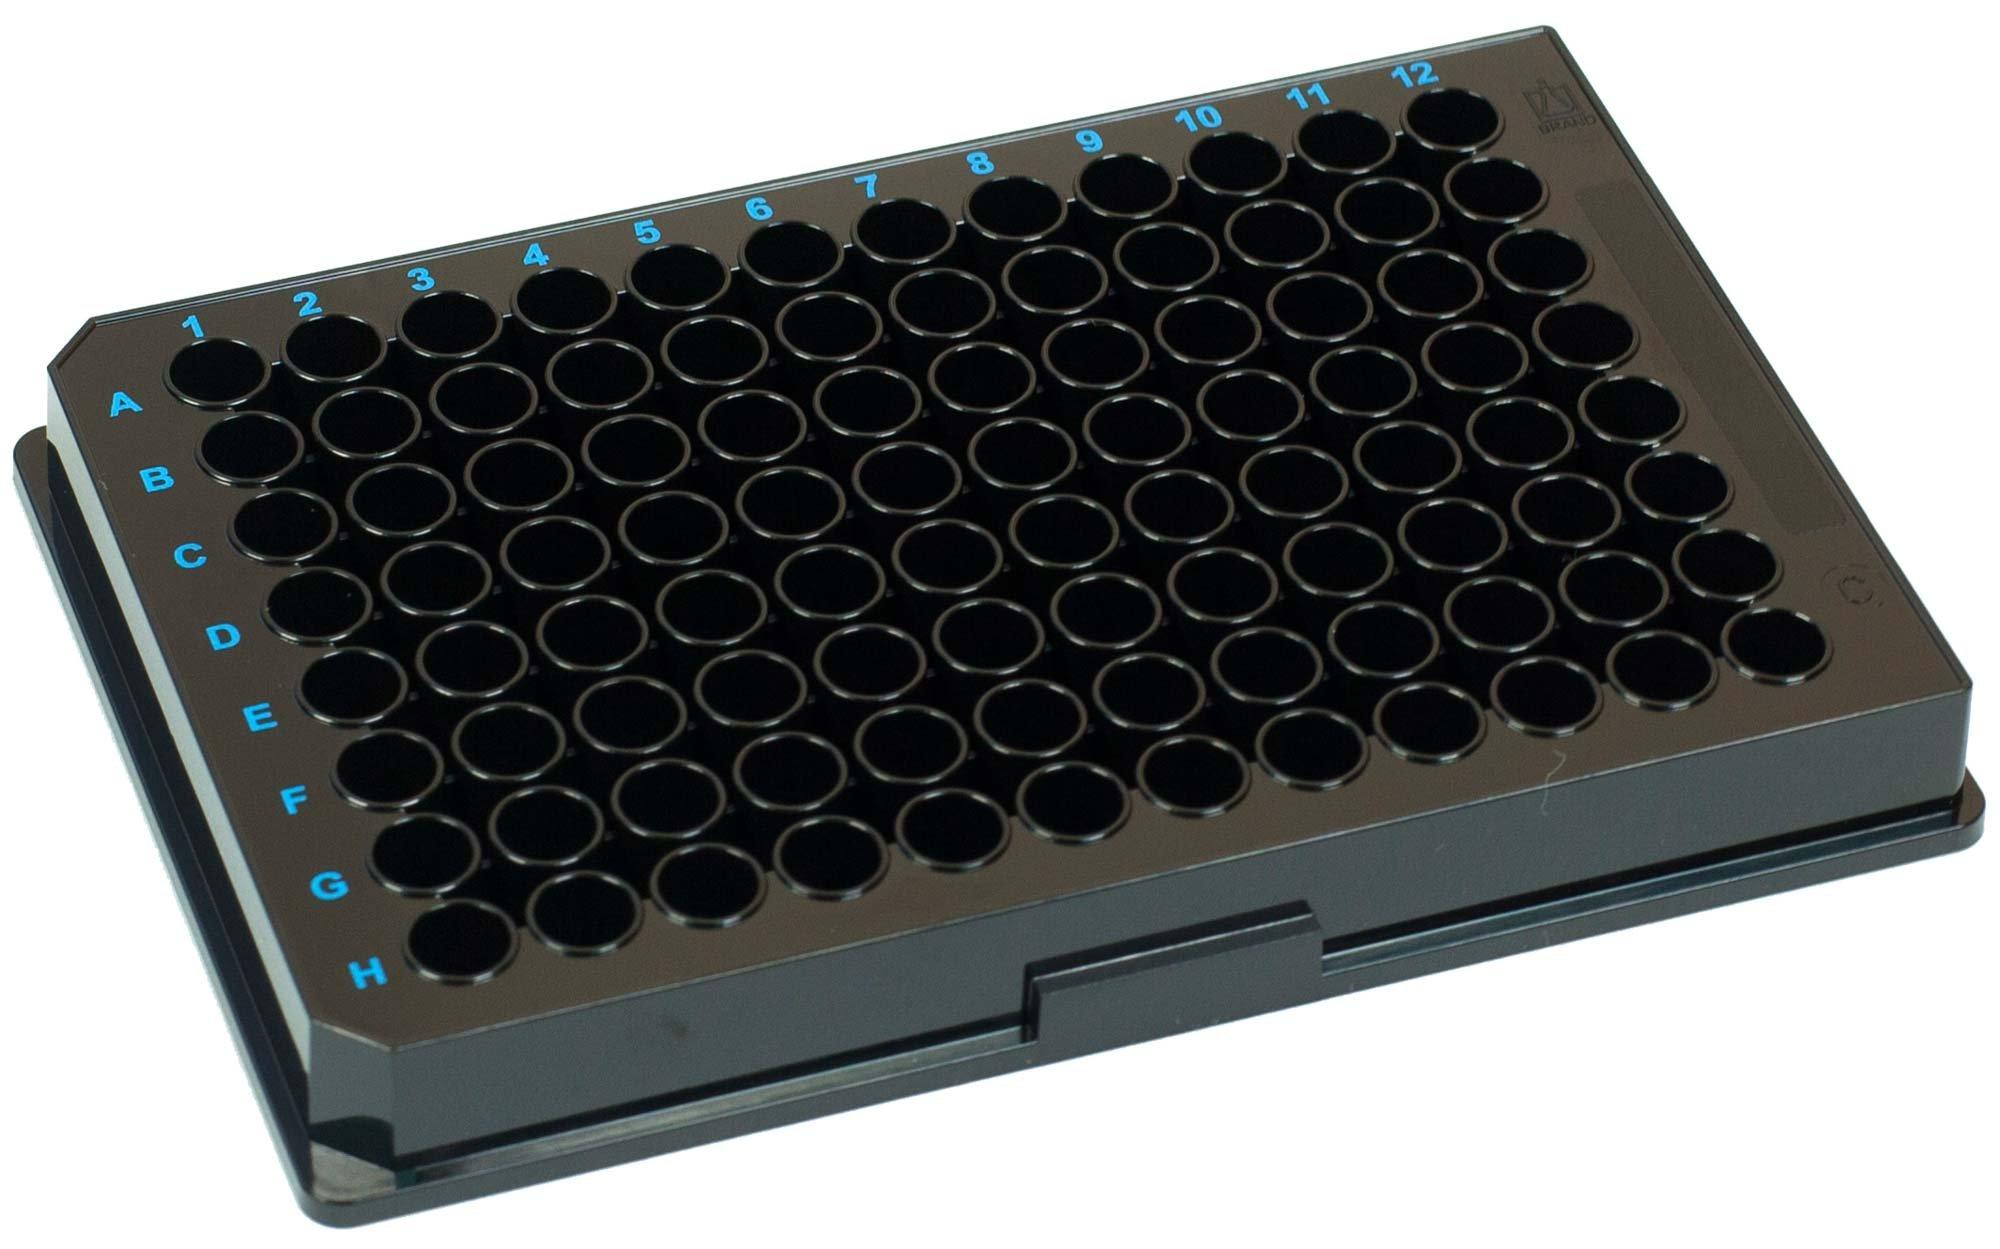 BRANDplates immunoGrade Non-Sterile Treated Surface 96-Well Plate - Black, C-Bottom